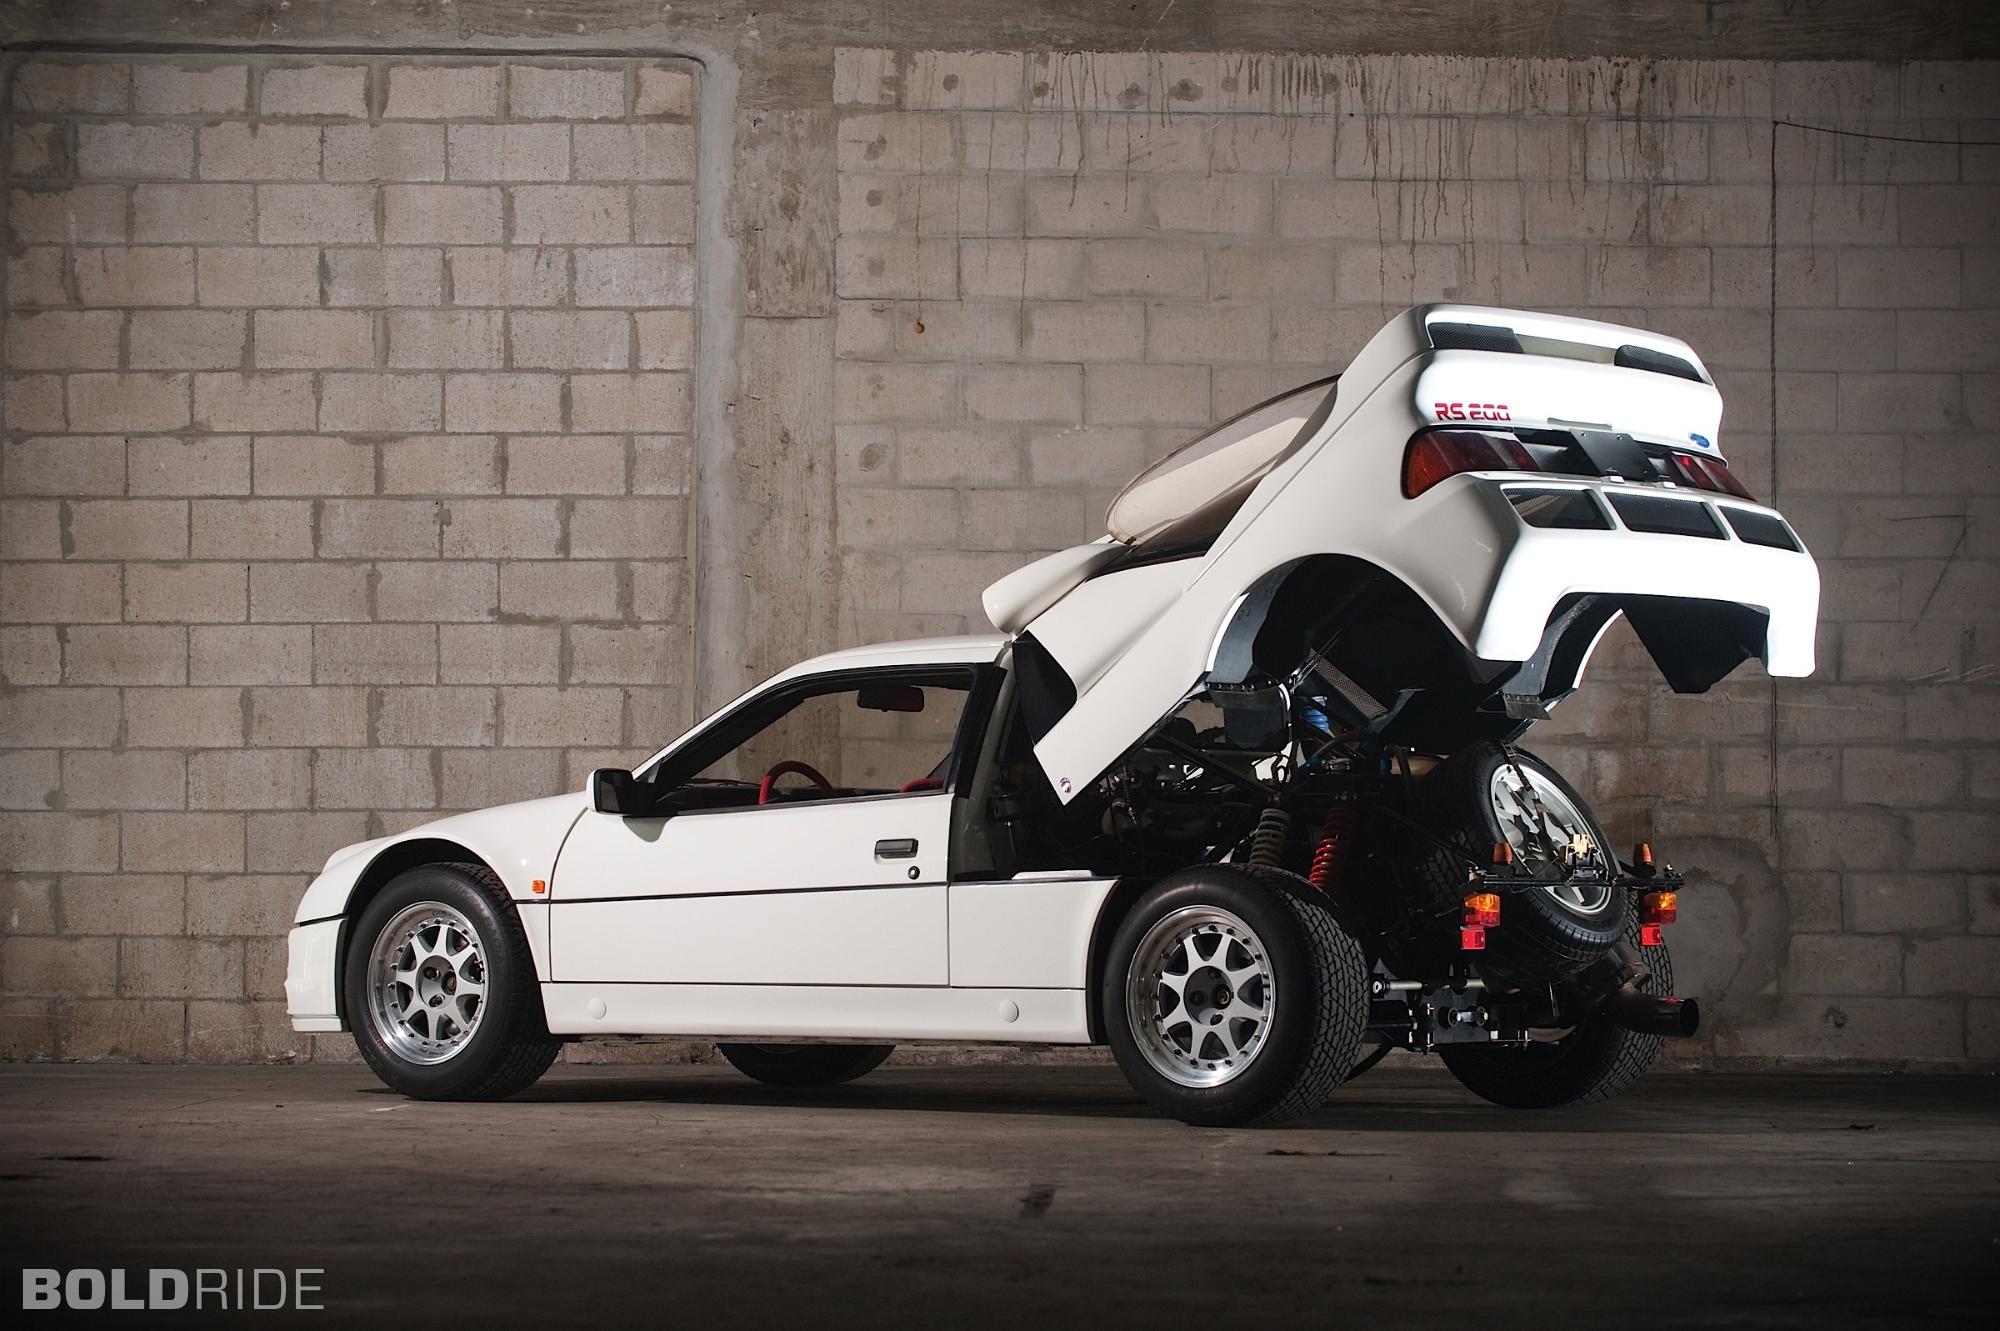 ford-rs200-evolution.2000x1331.Jan-04-2012_21.28.34.206026